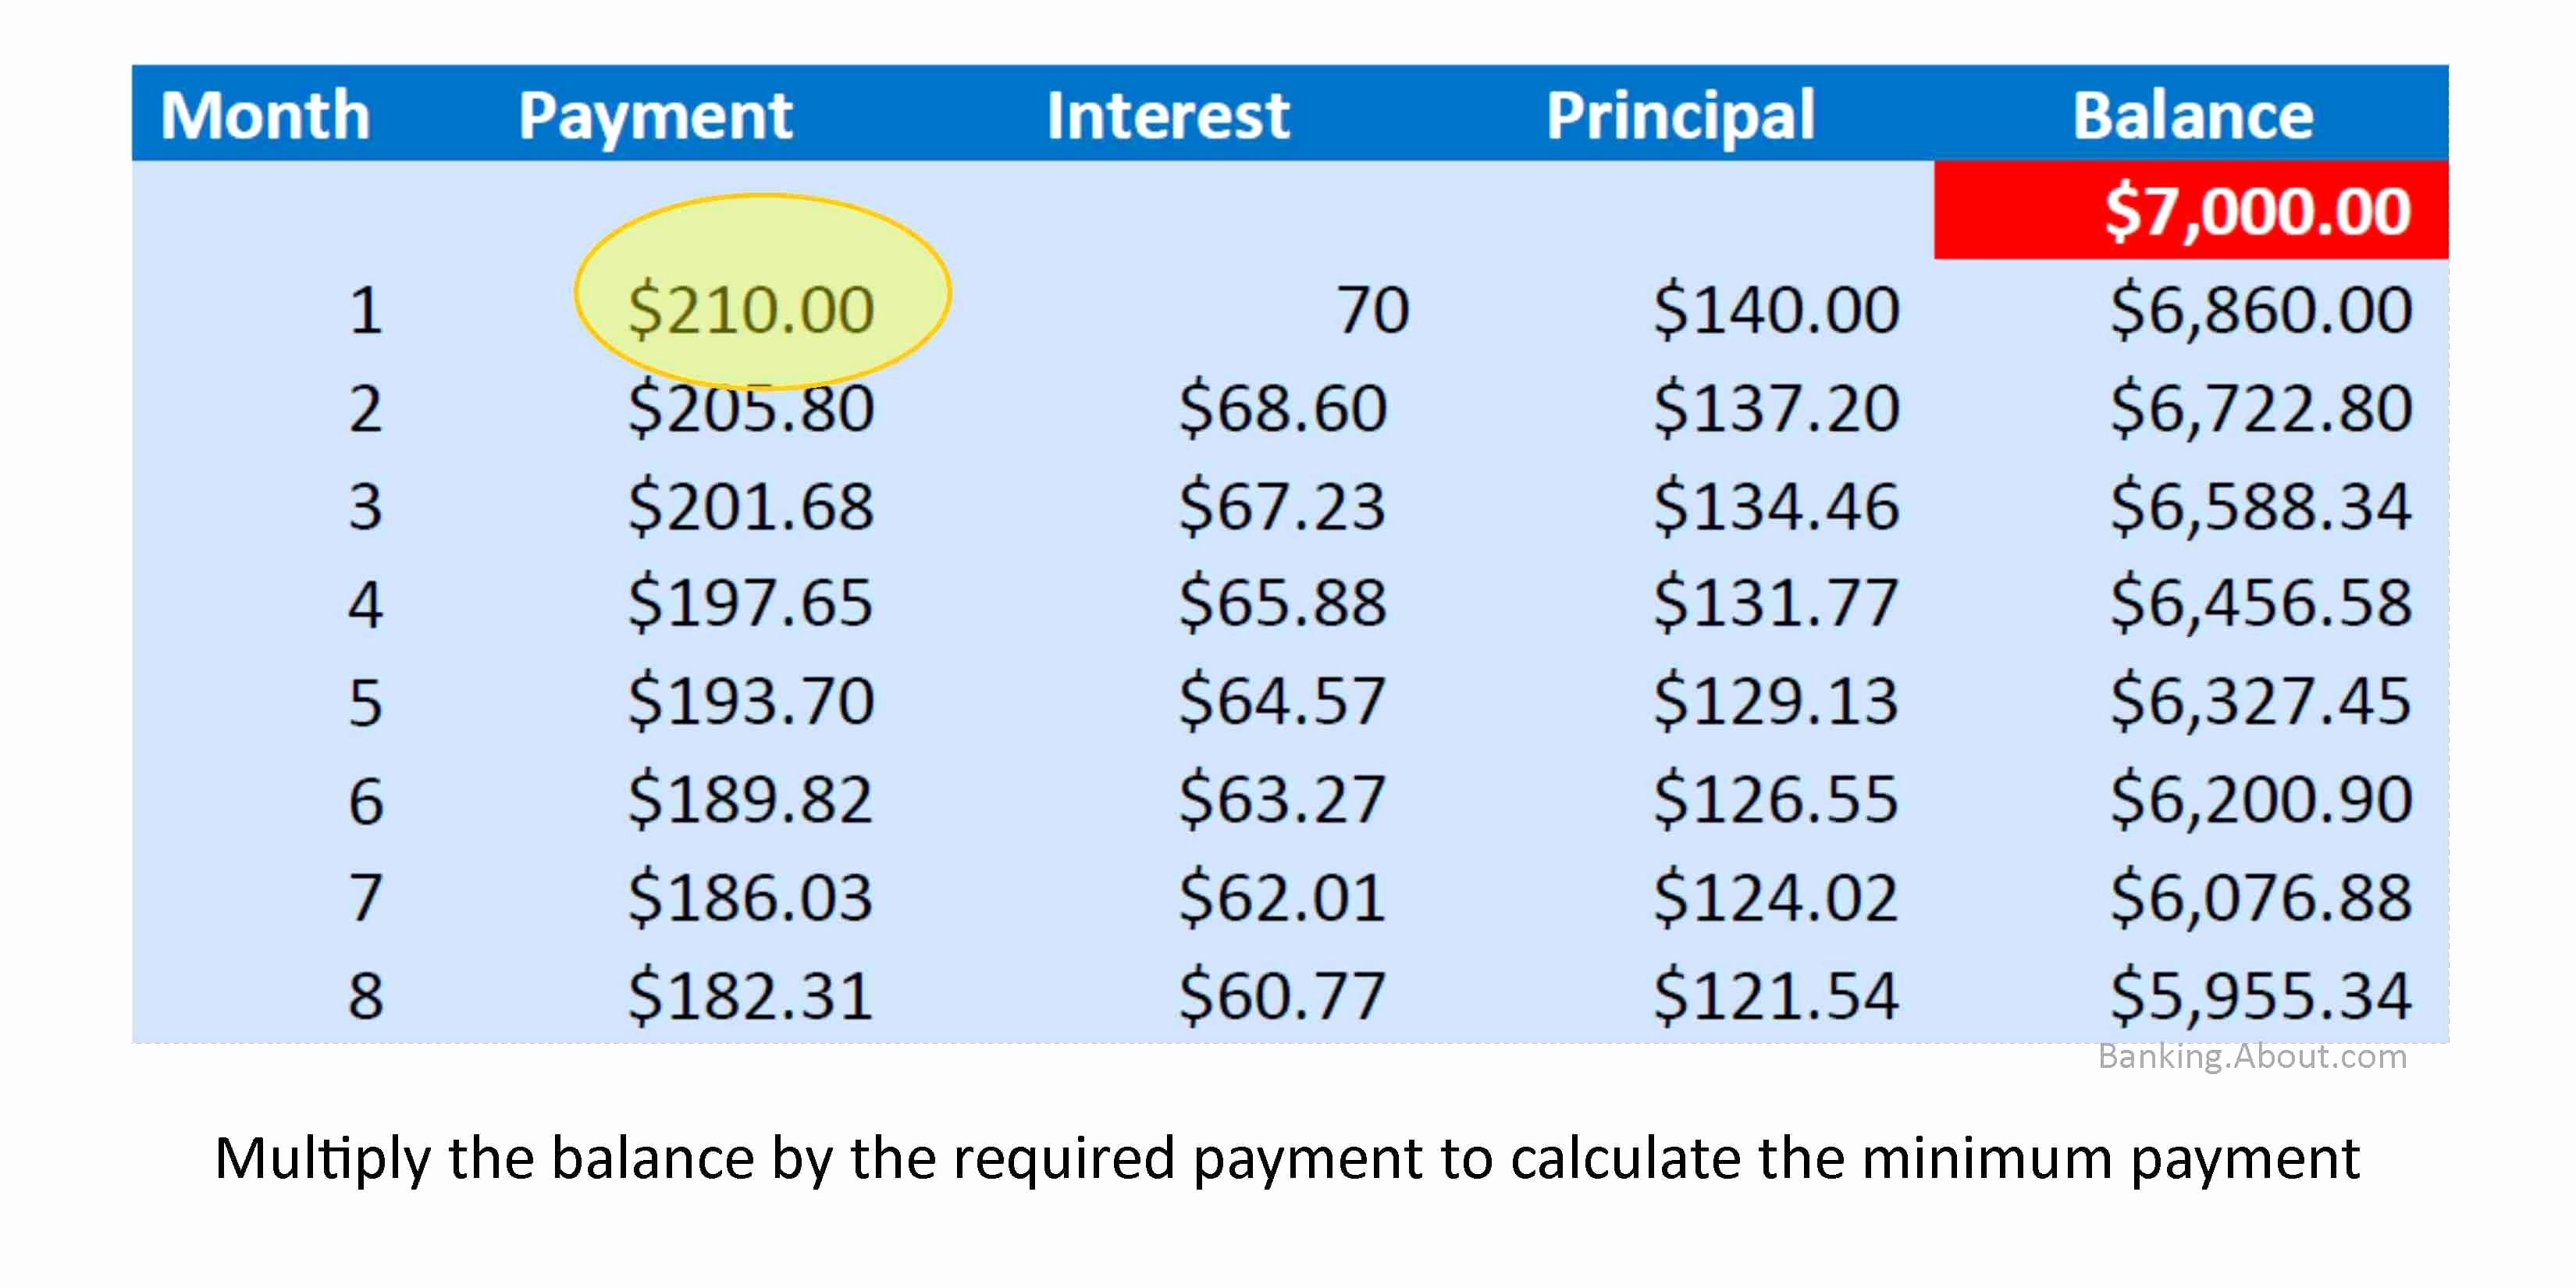 Social Security Benefits Estimator Spreadsheet Pertaining To Example Of Social Security Benefit Calculation Spreadsheet